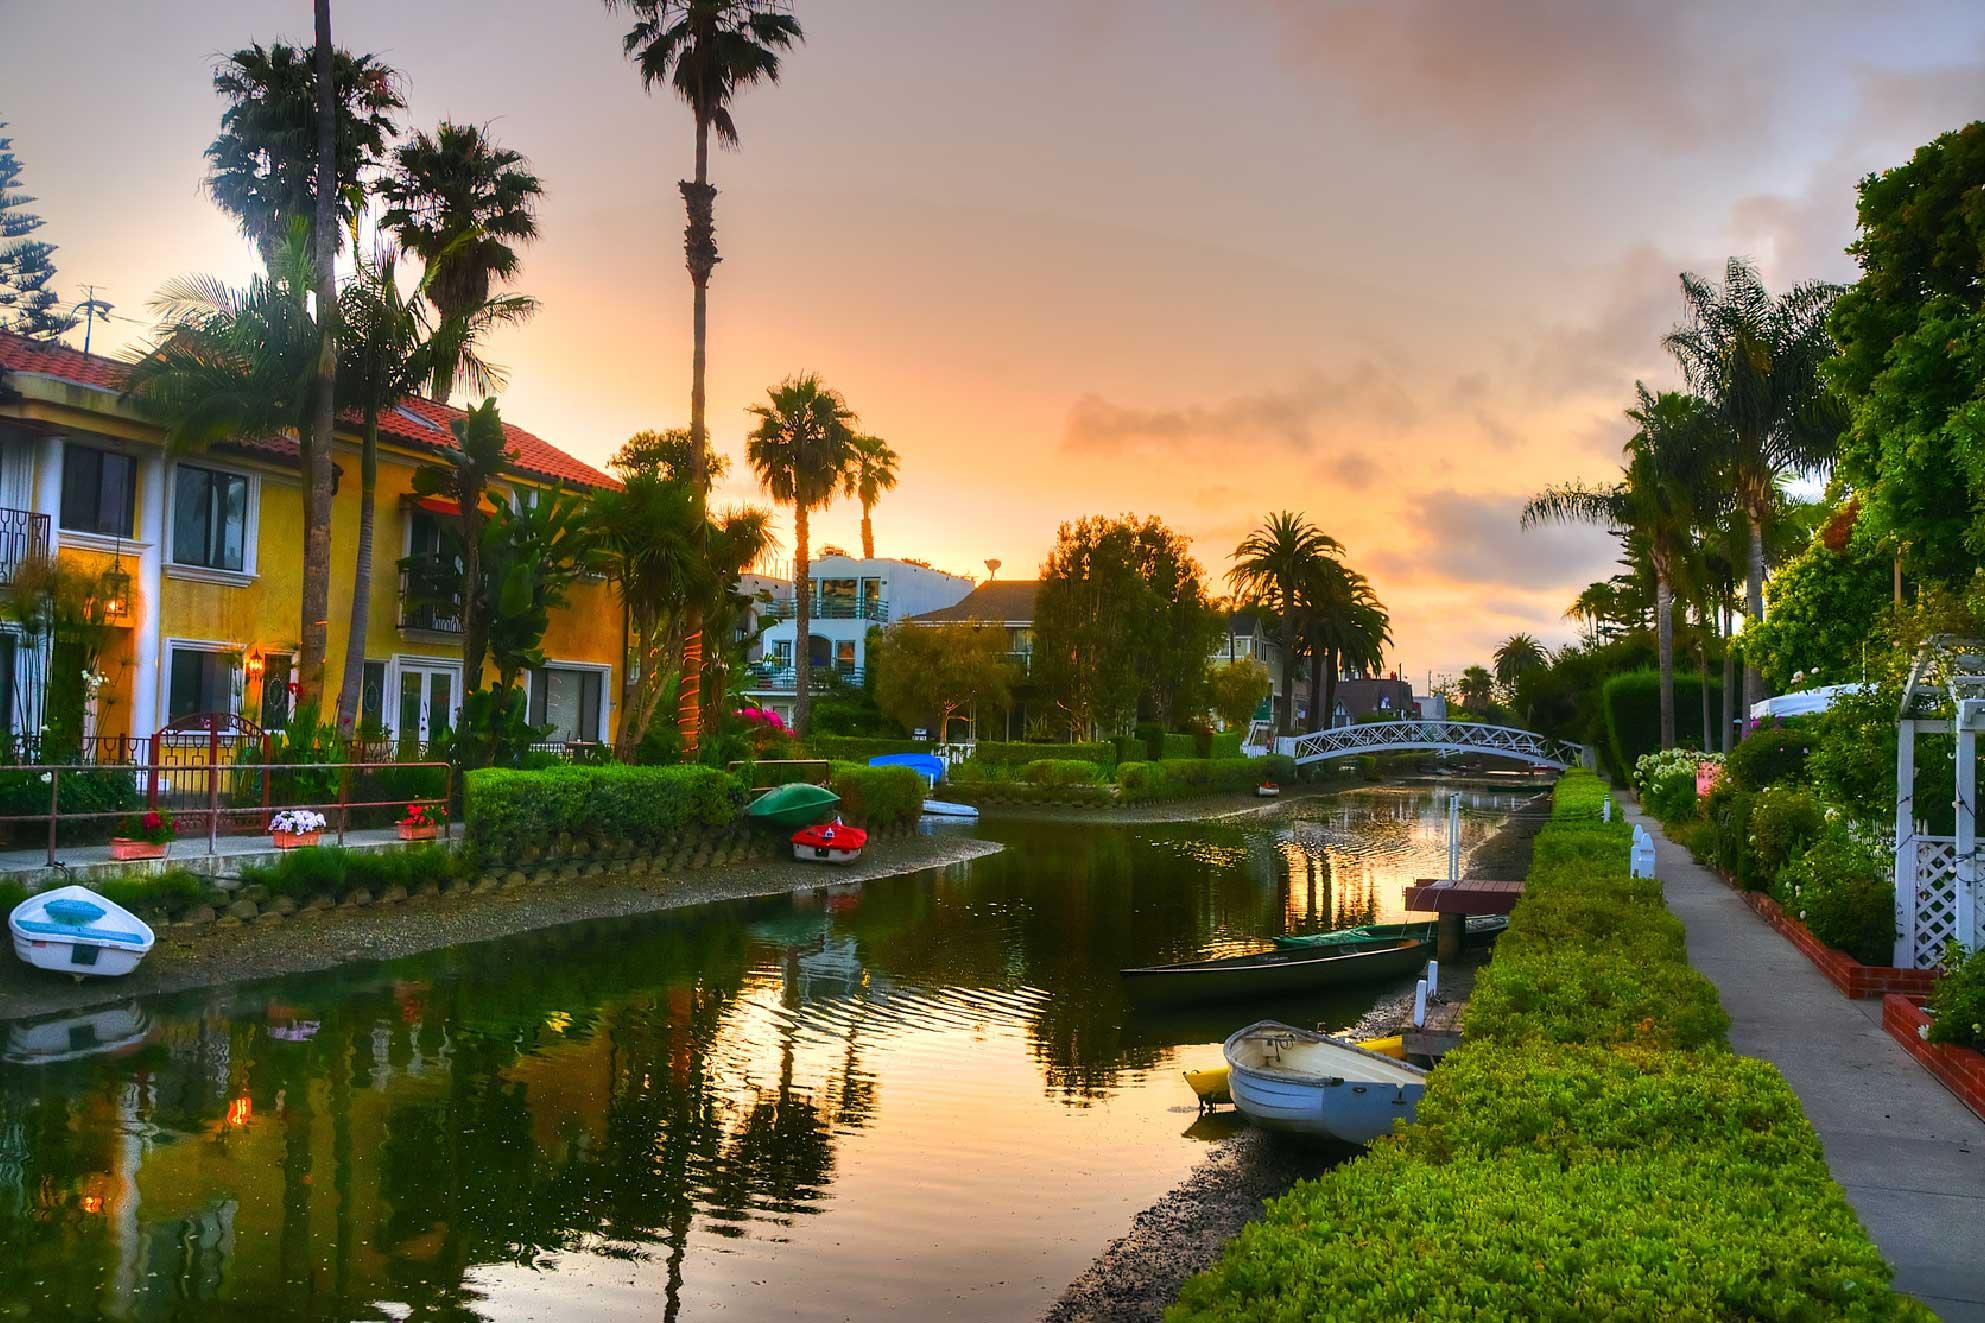 Video: Canals of Venice Beach – Venice Beach